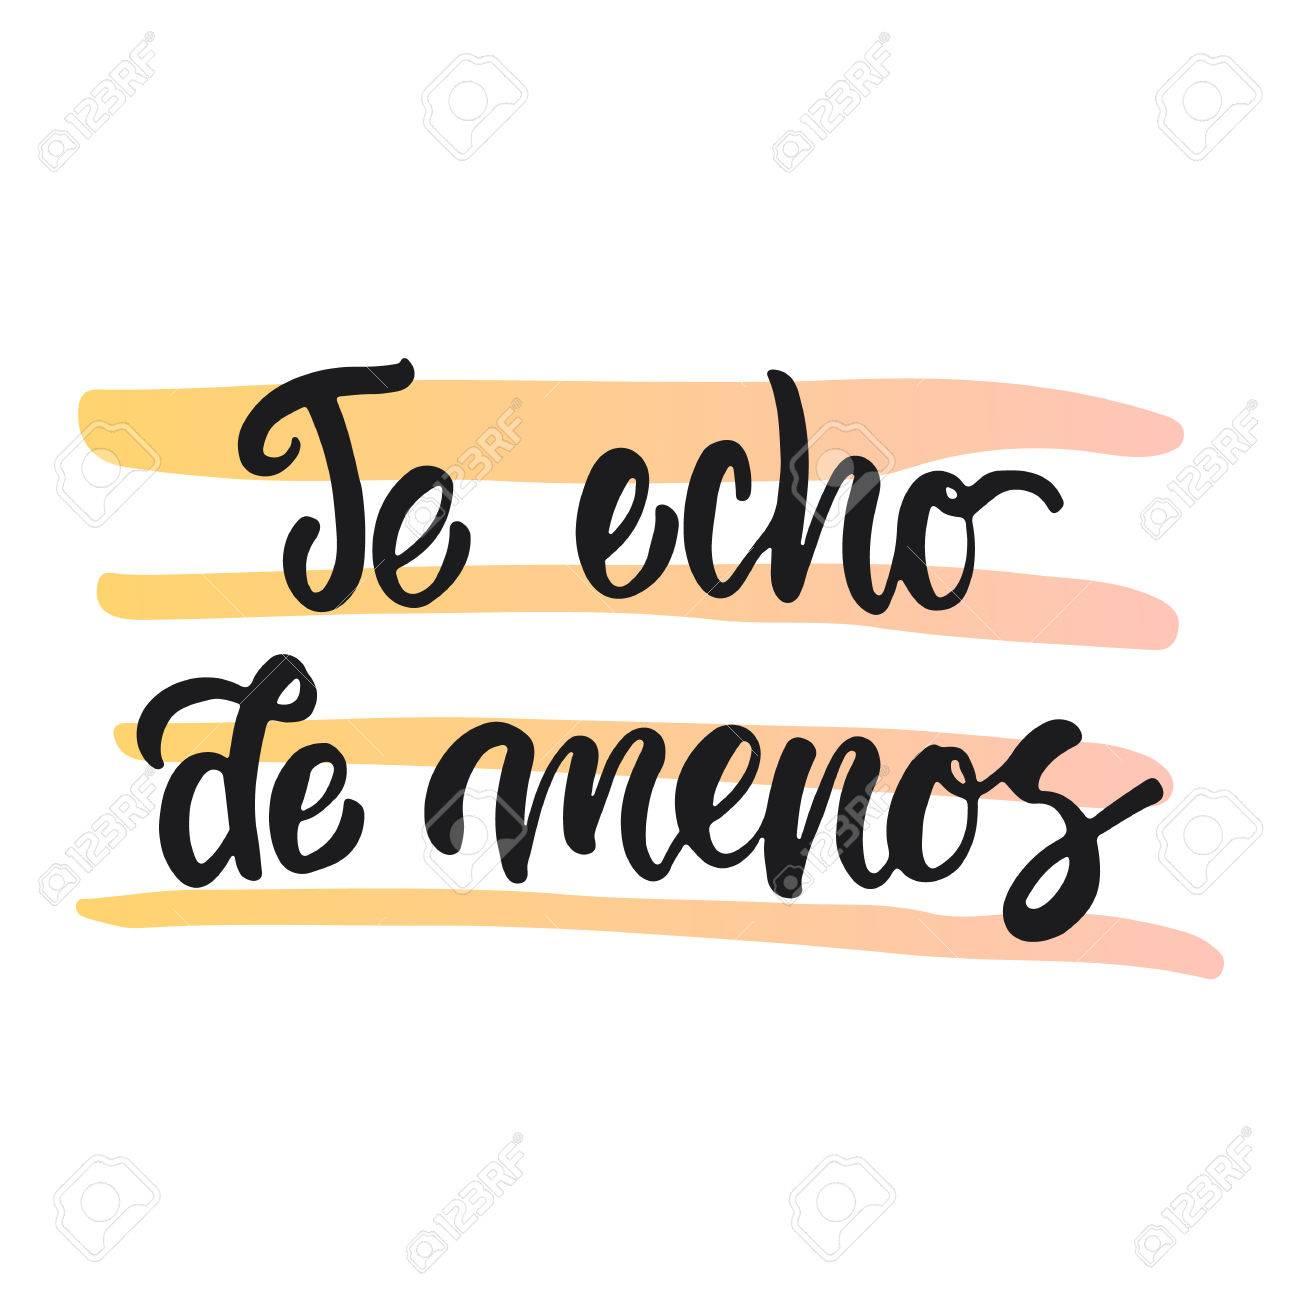 Te Echo De Menos I Miss You Lettering Calligraphy Phrase In